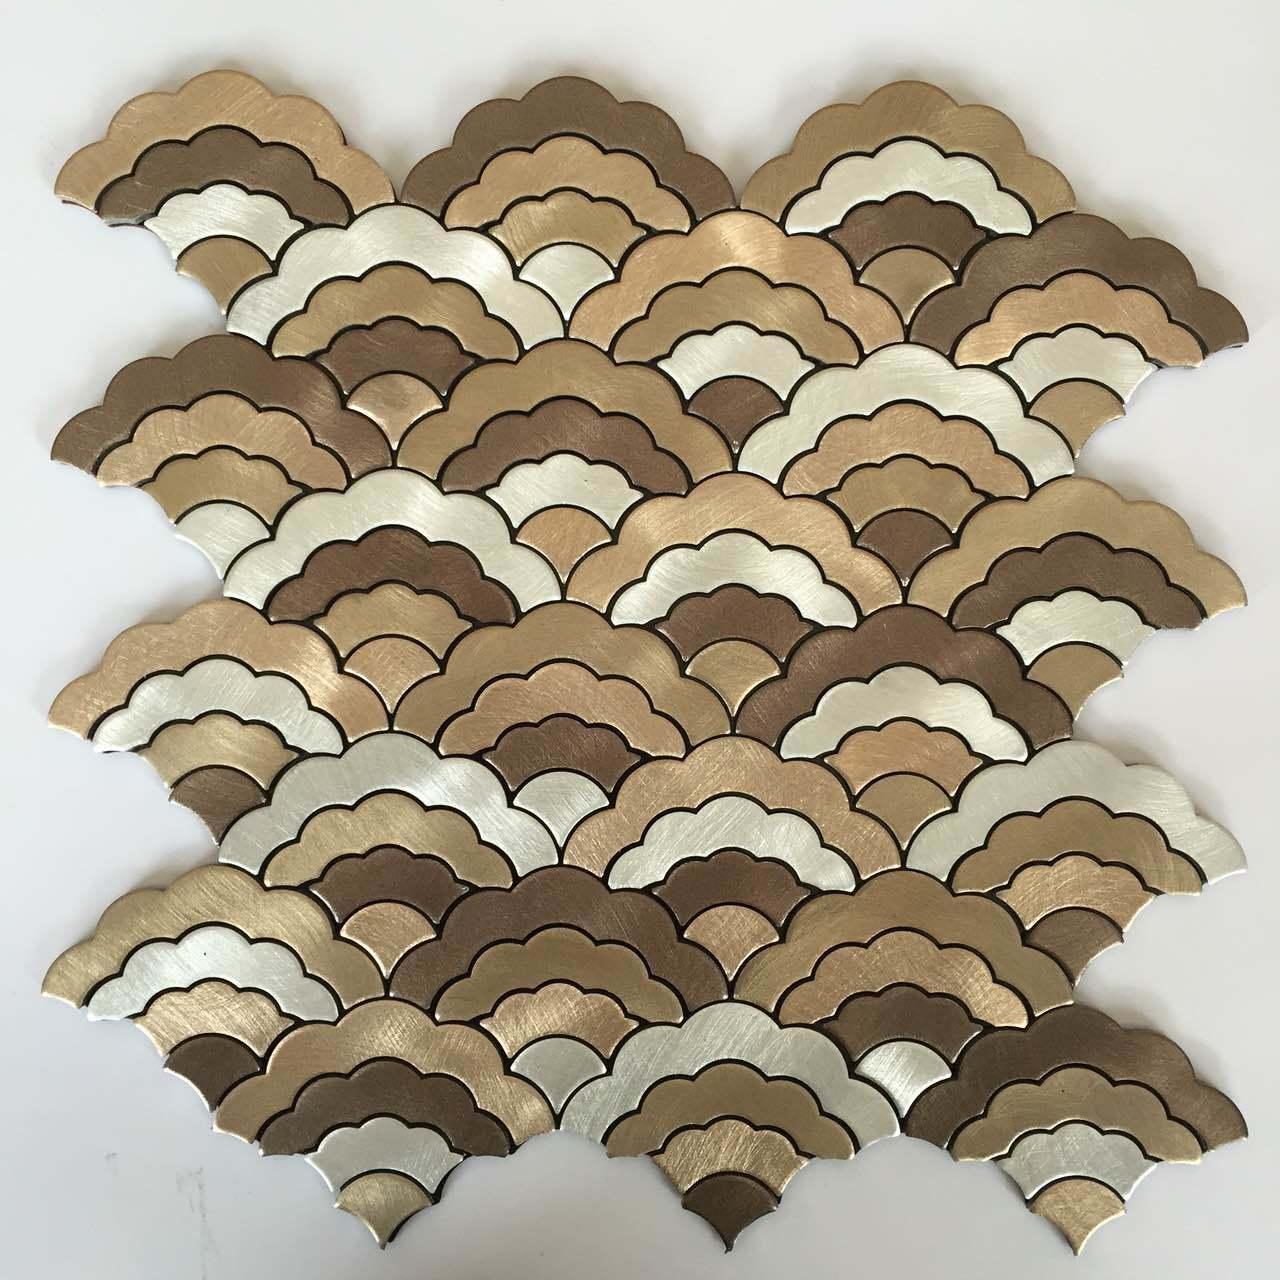 Aluminum Plastic Mosaic Floor Tiles for Sale